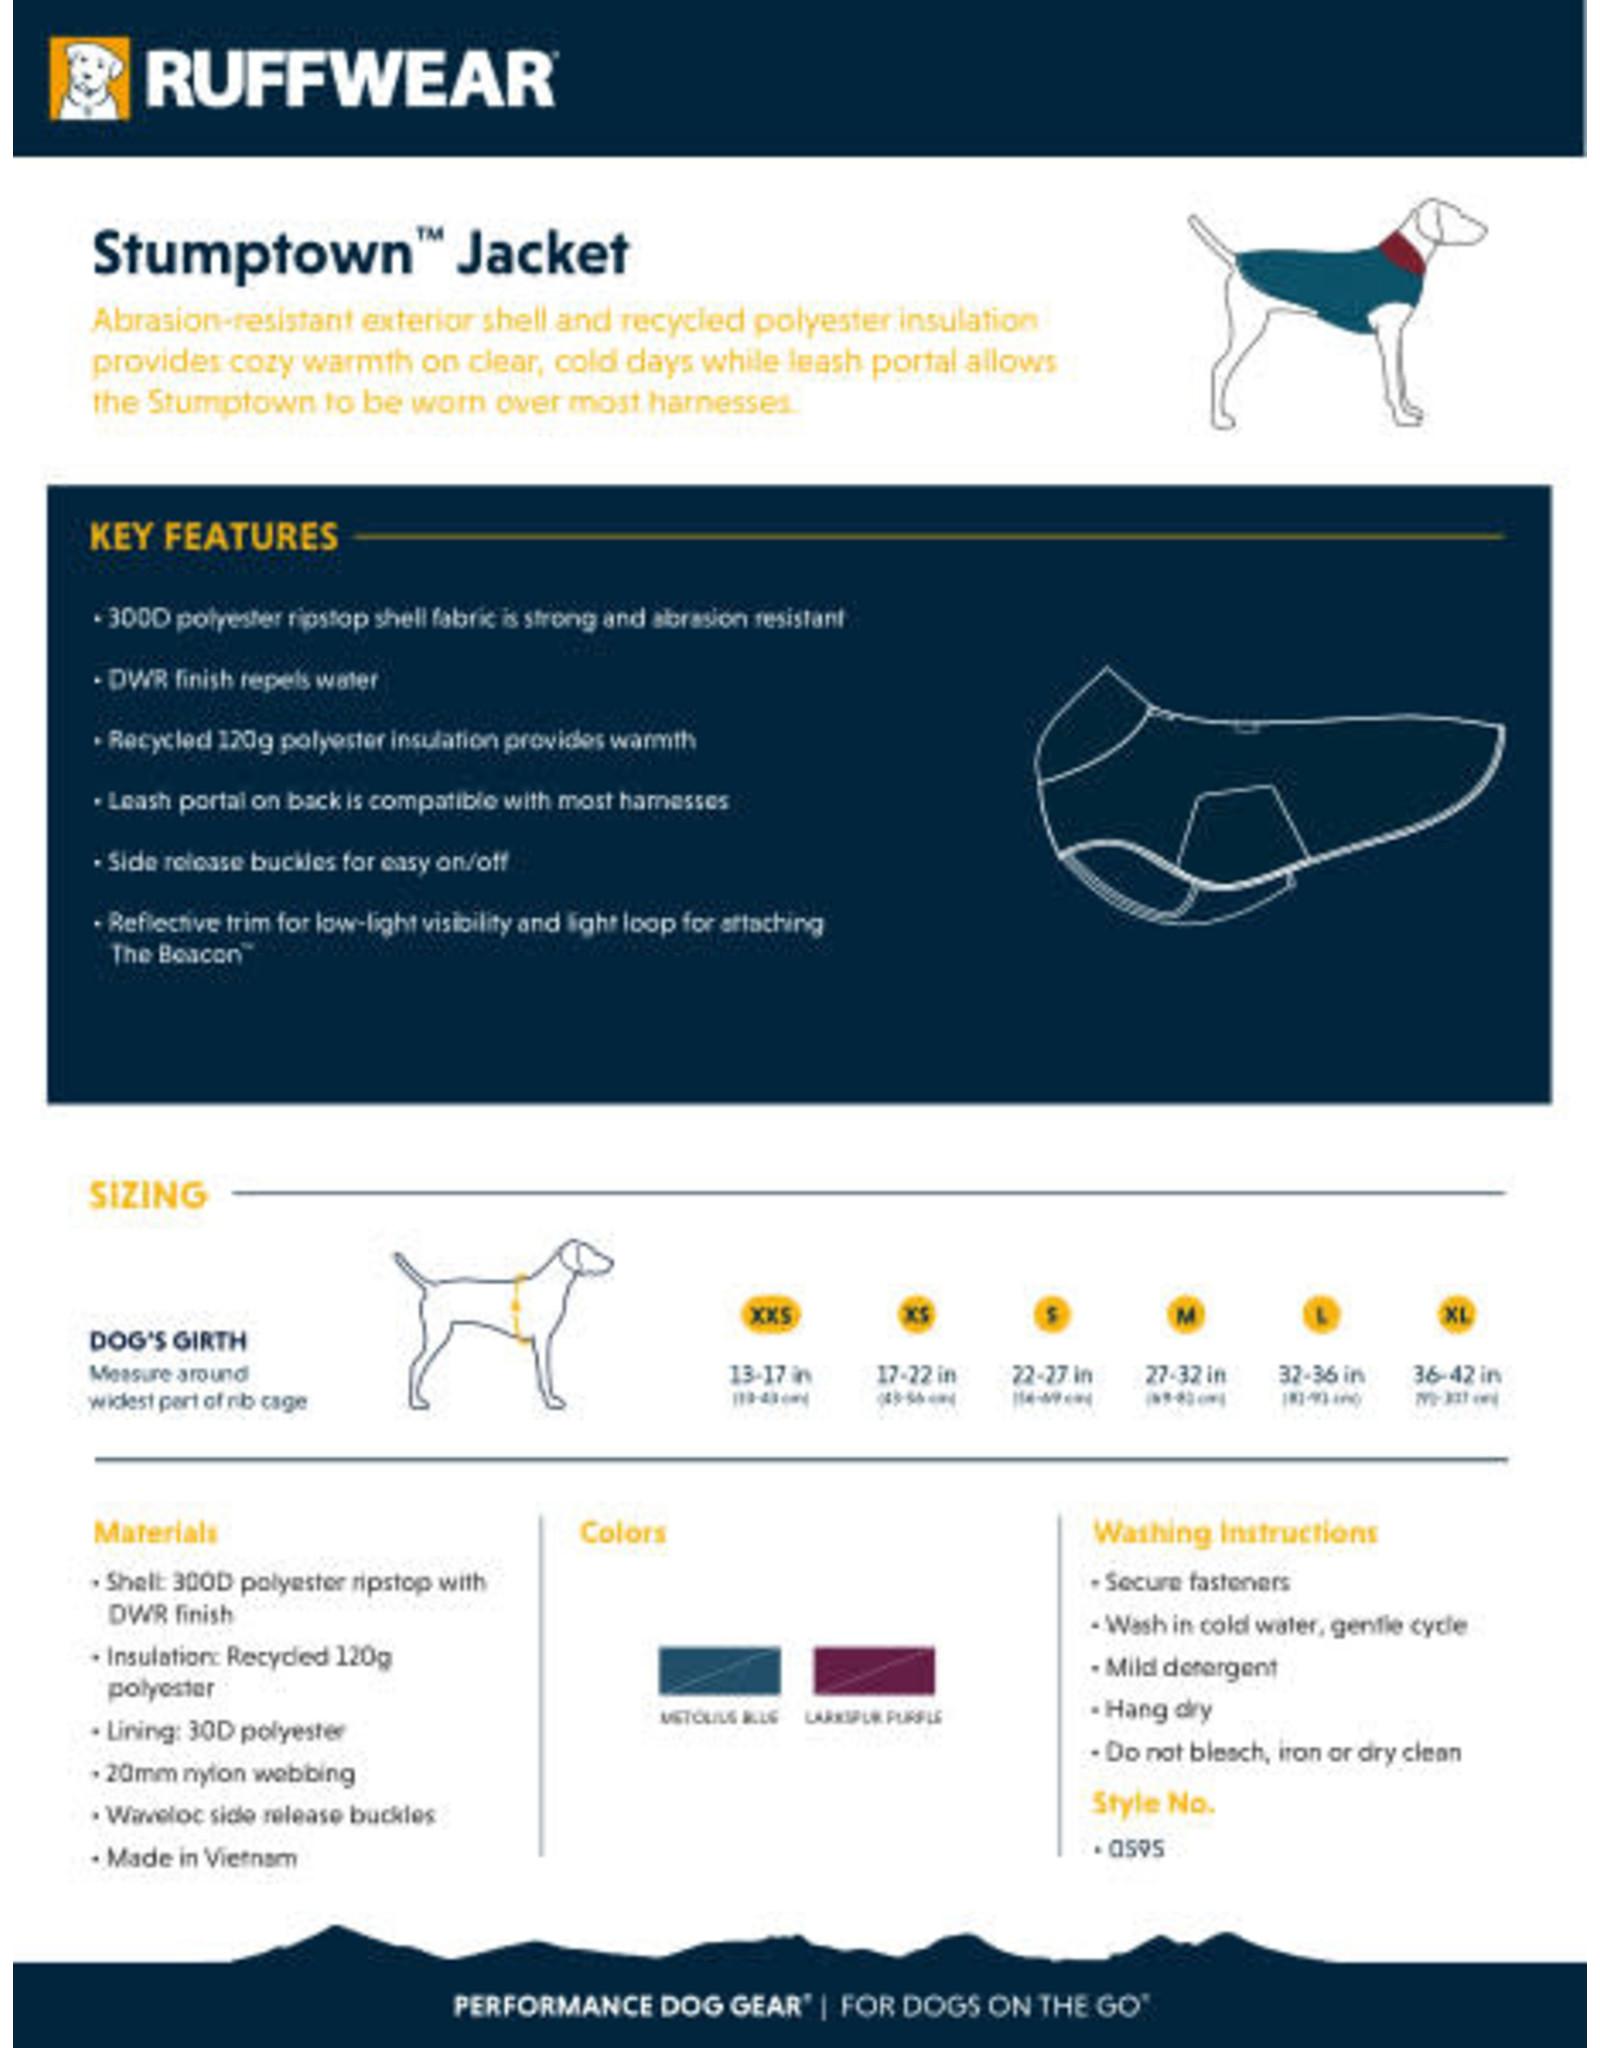 Ruffwear Stumptown Jacket: Metolius Blue, L